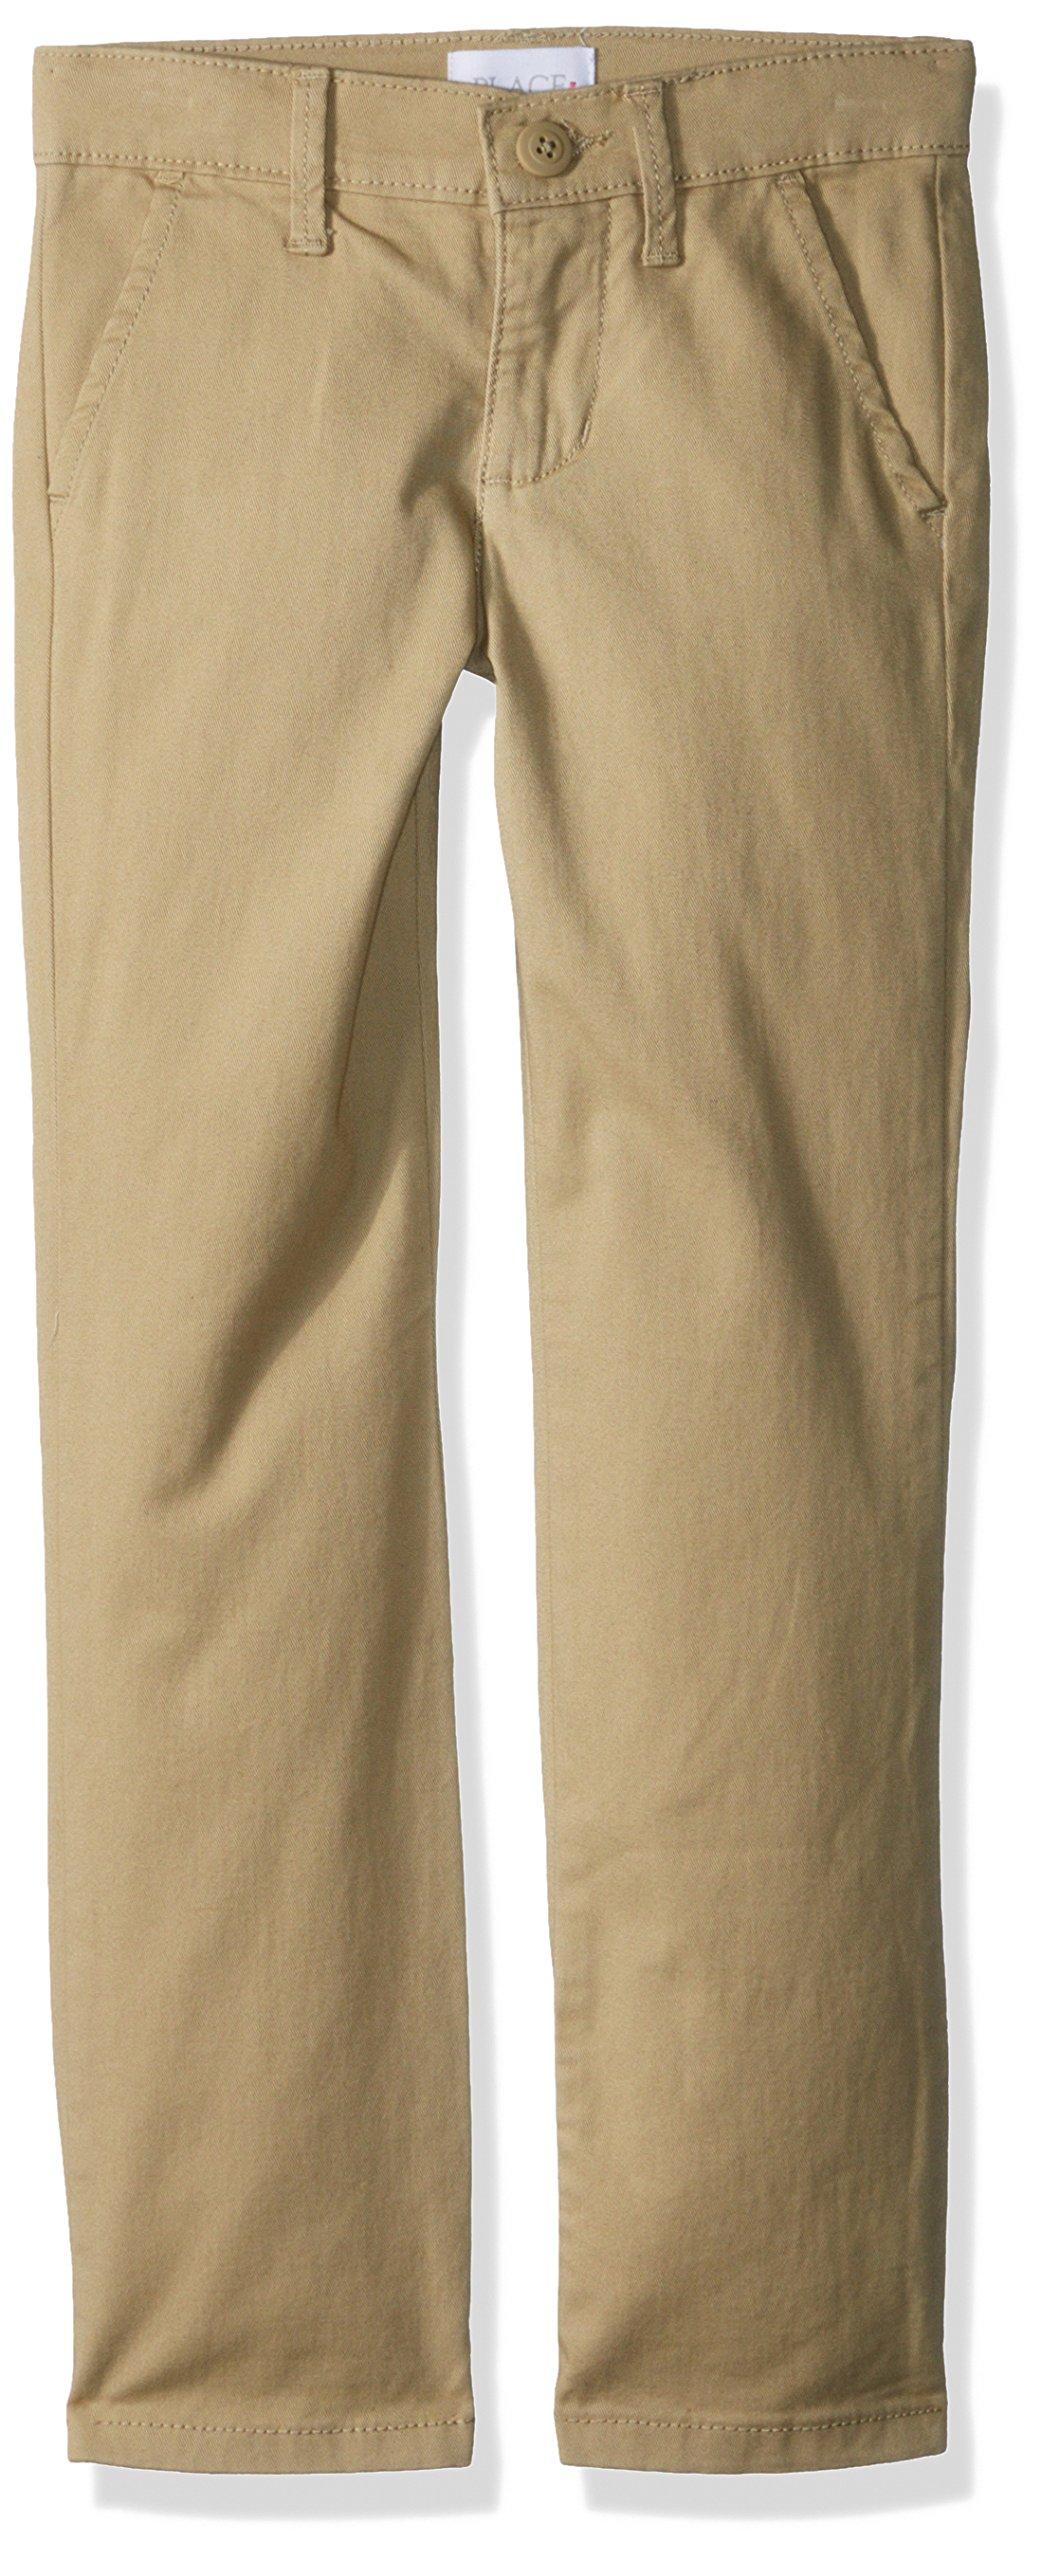 The Children's Place Big Girls' Skinny Pants, Sandy, 6X/7S